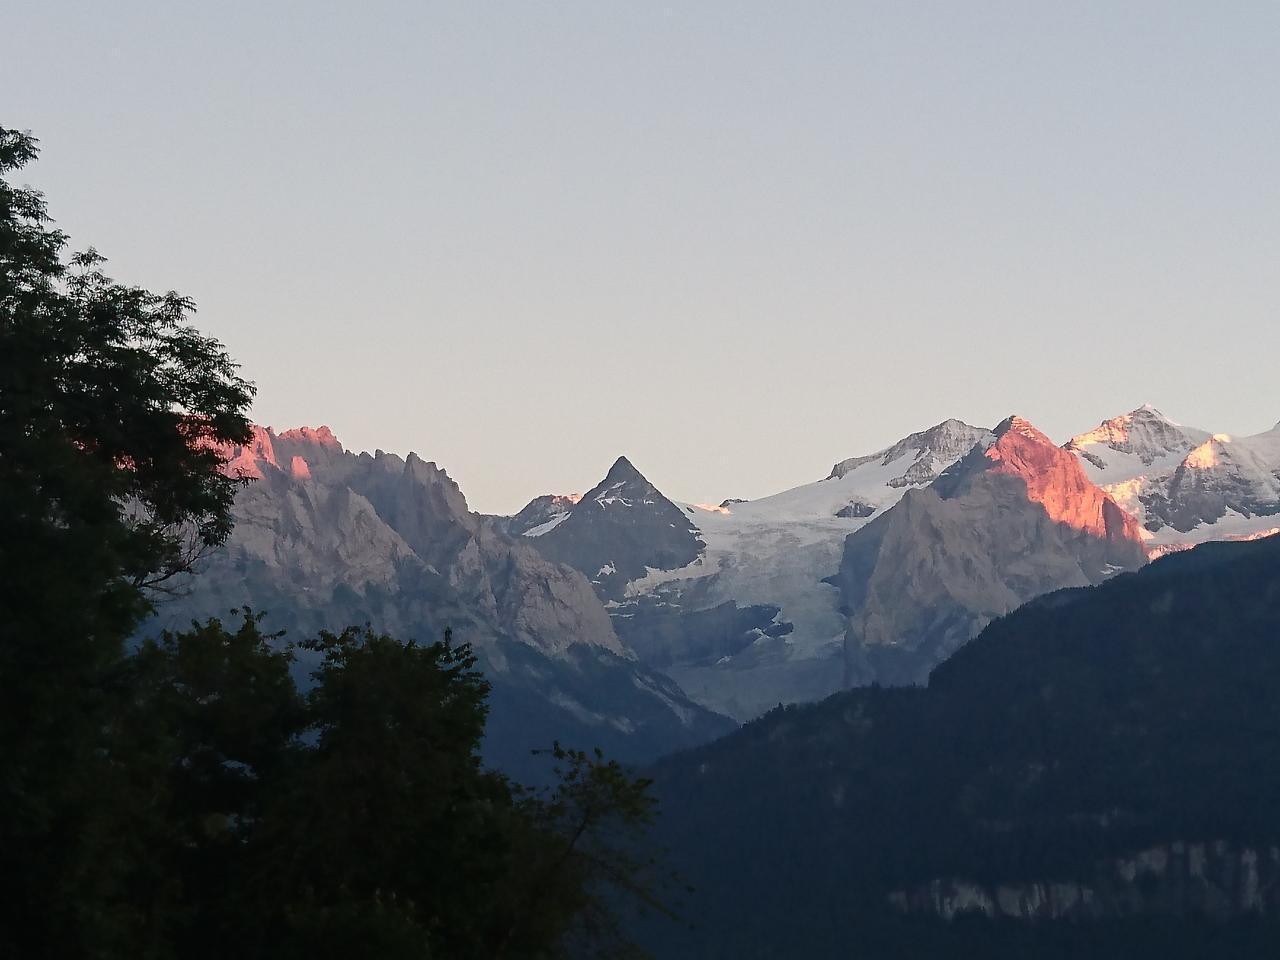 Ferienwohnung Obererli 4-Bettwohnung (2692316), Hasliberg Hohfluh, Meiringen - Hasliberg, Berner Oberland, Schweiz, Bild 10